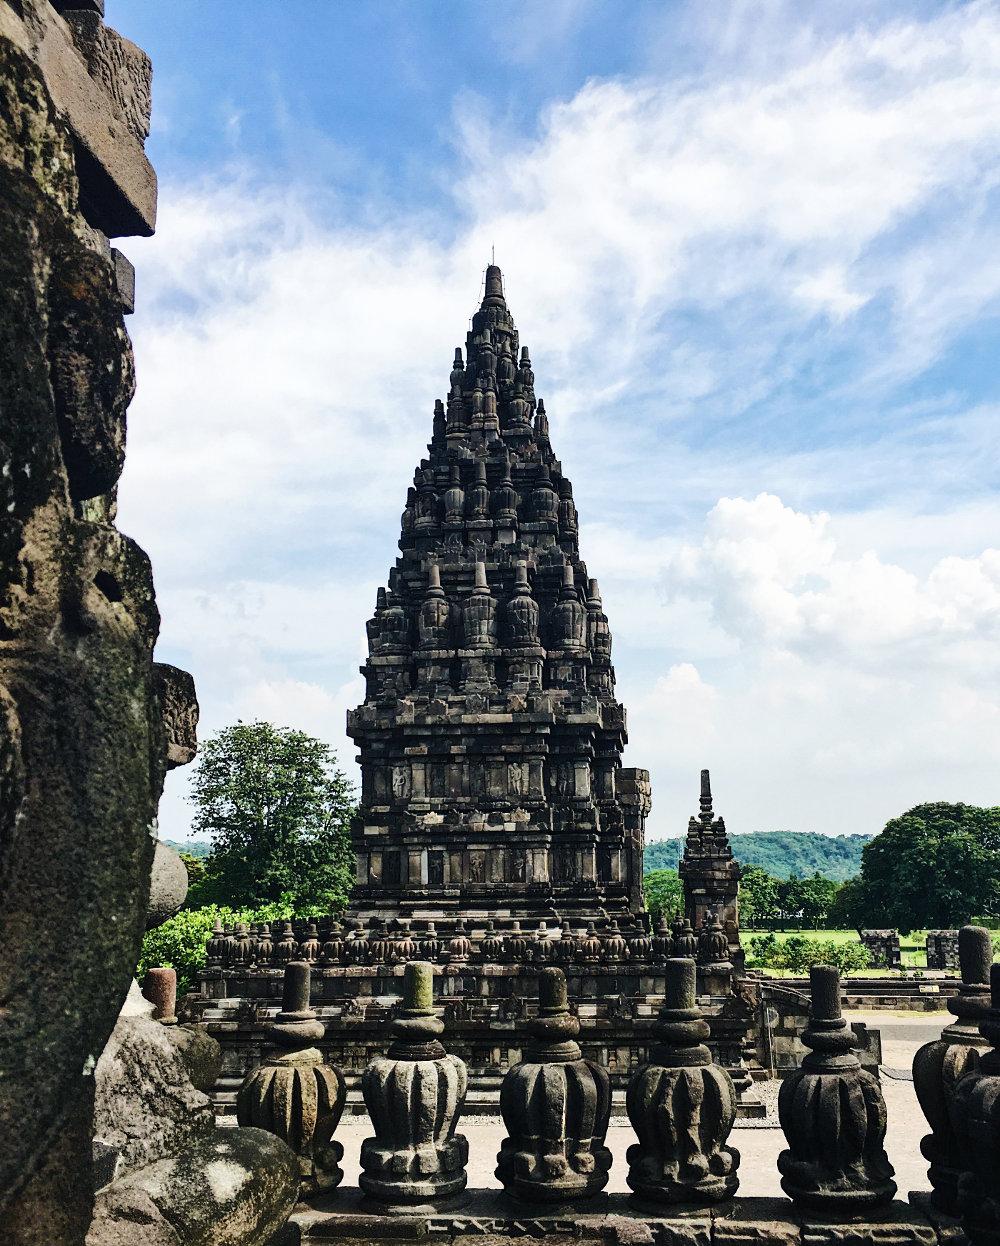 Kuala Lumpur, Singapore, Yogyakarta Travelling Impressions through my Phone